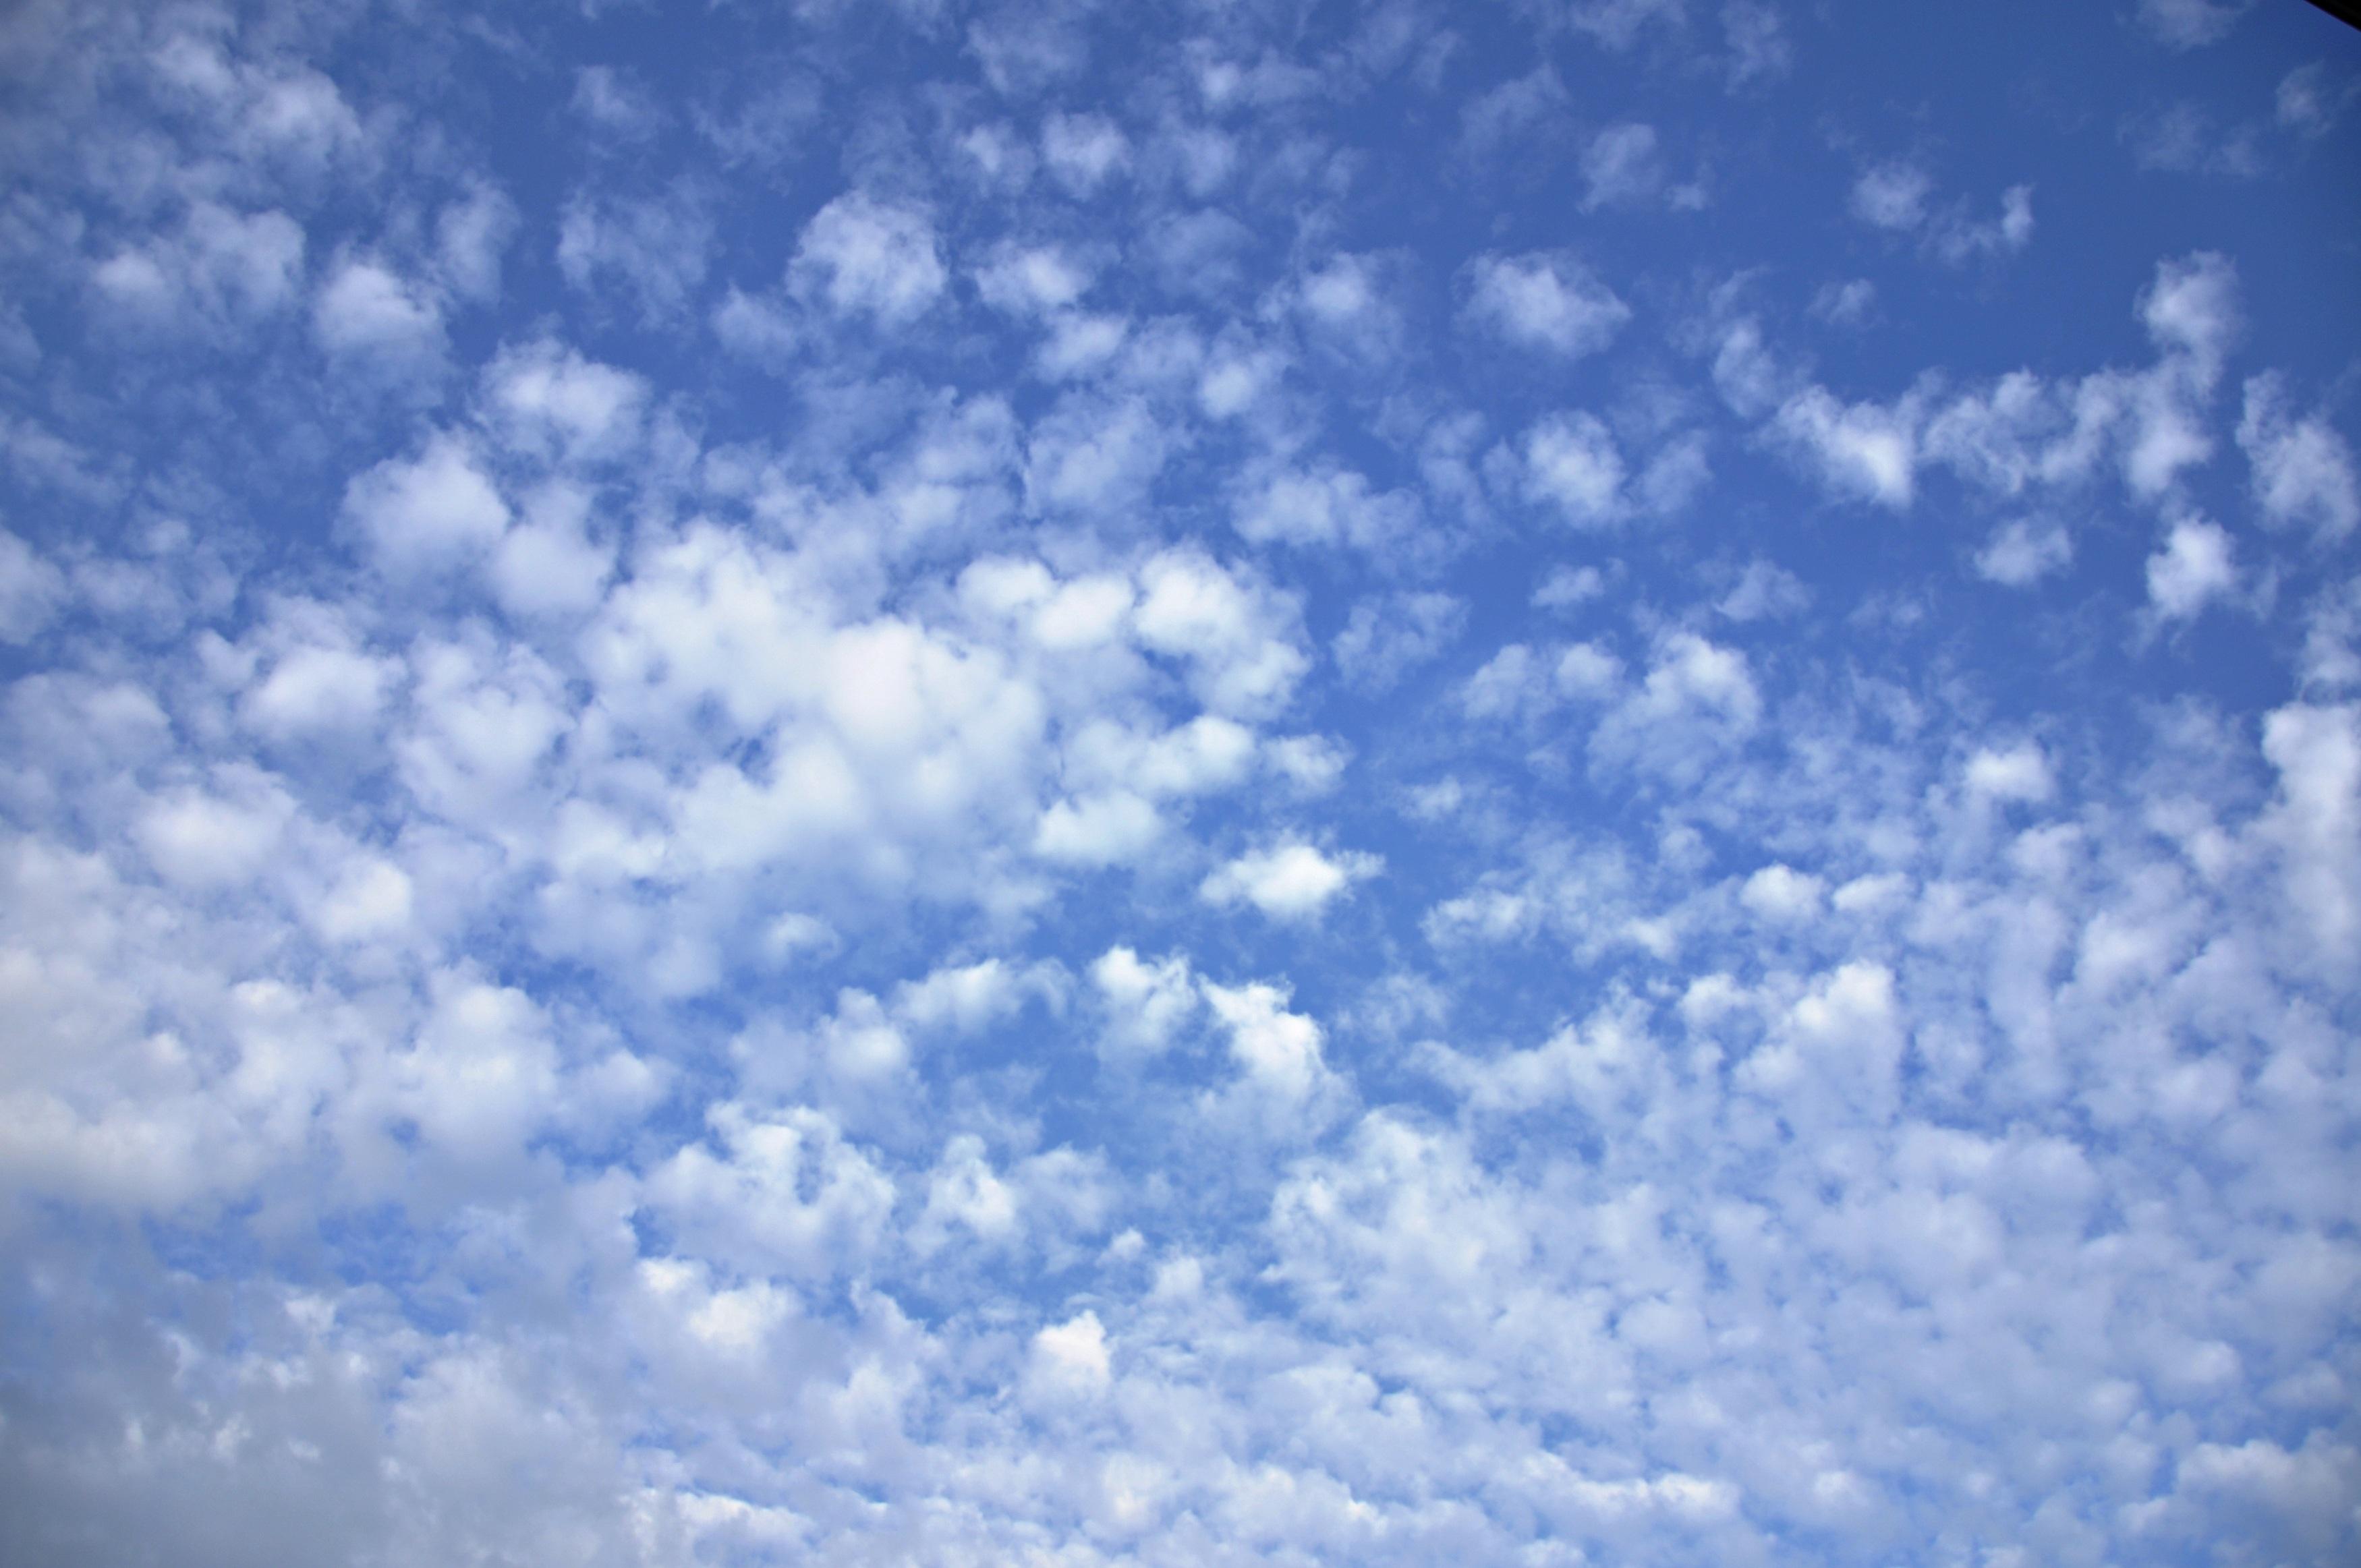 free images horizon cloud sunlight daytime cumulus clouds sky